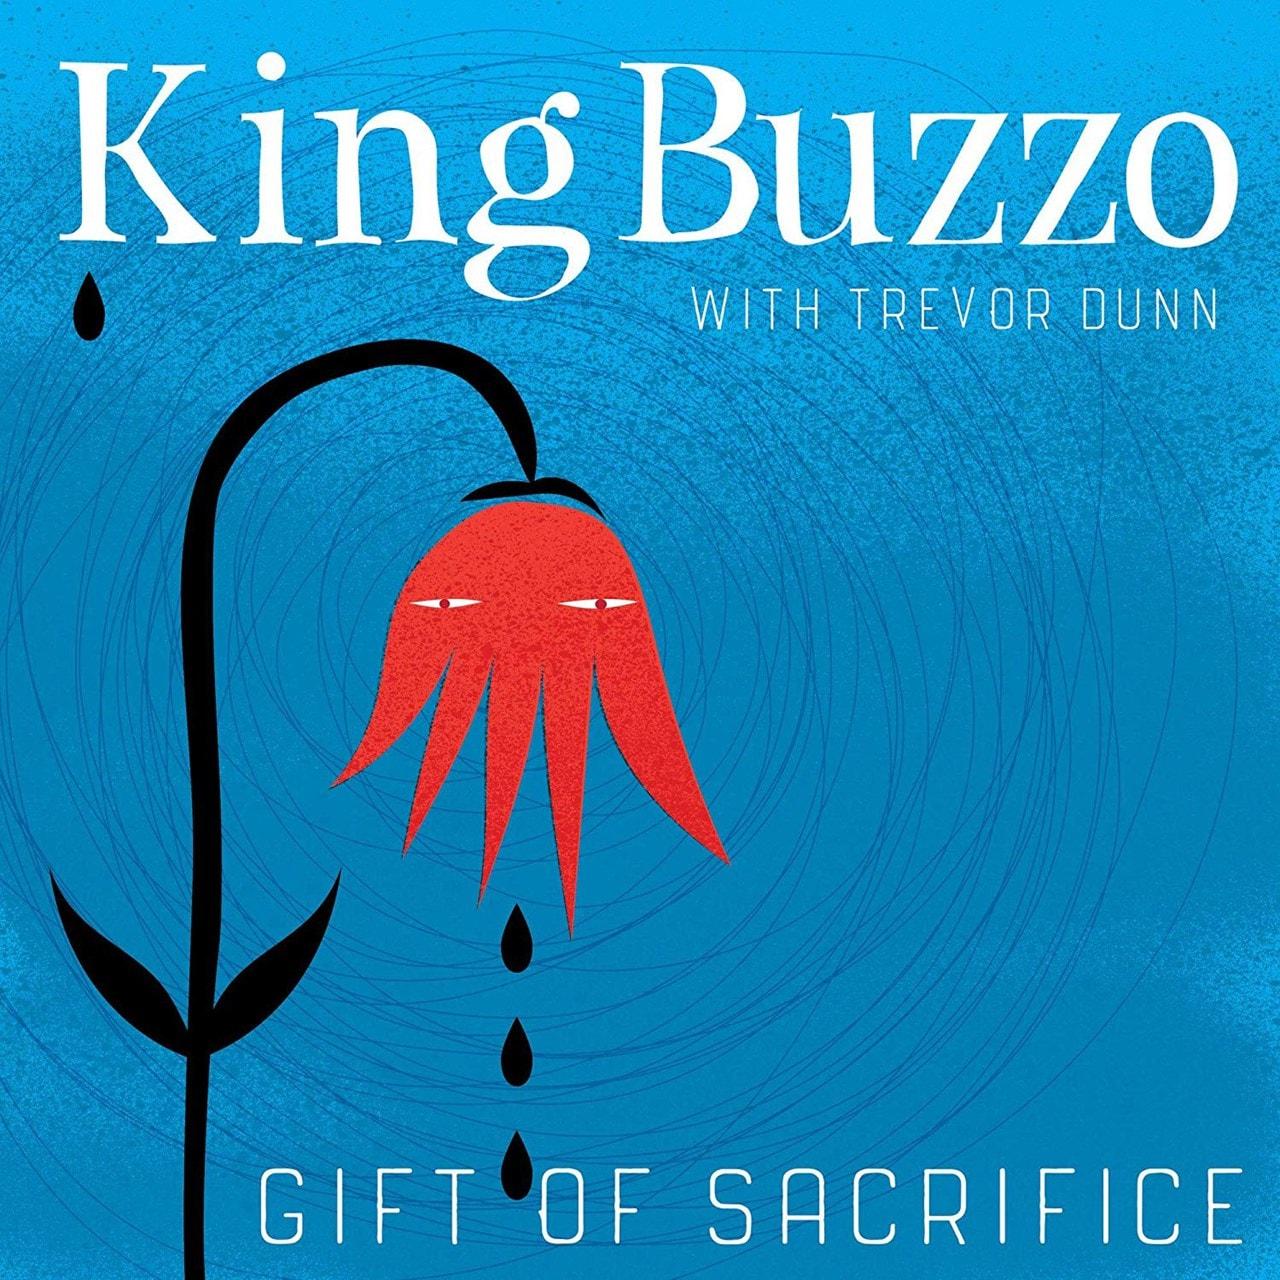 Gift of Sacrifice - 1